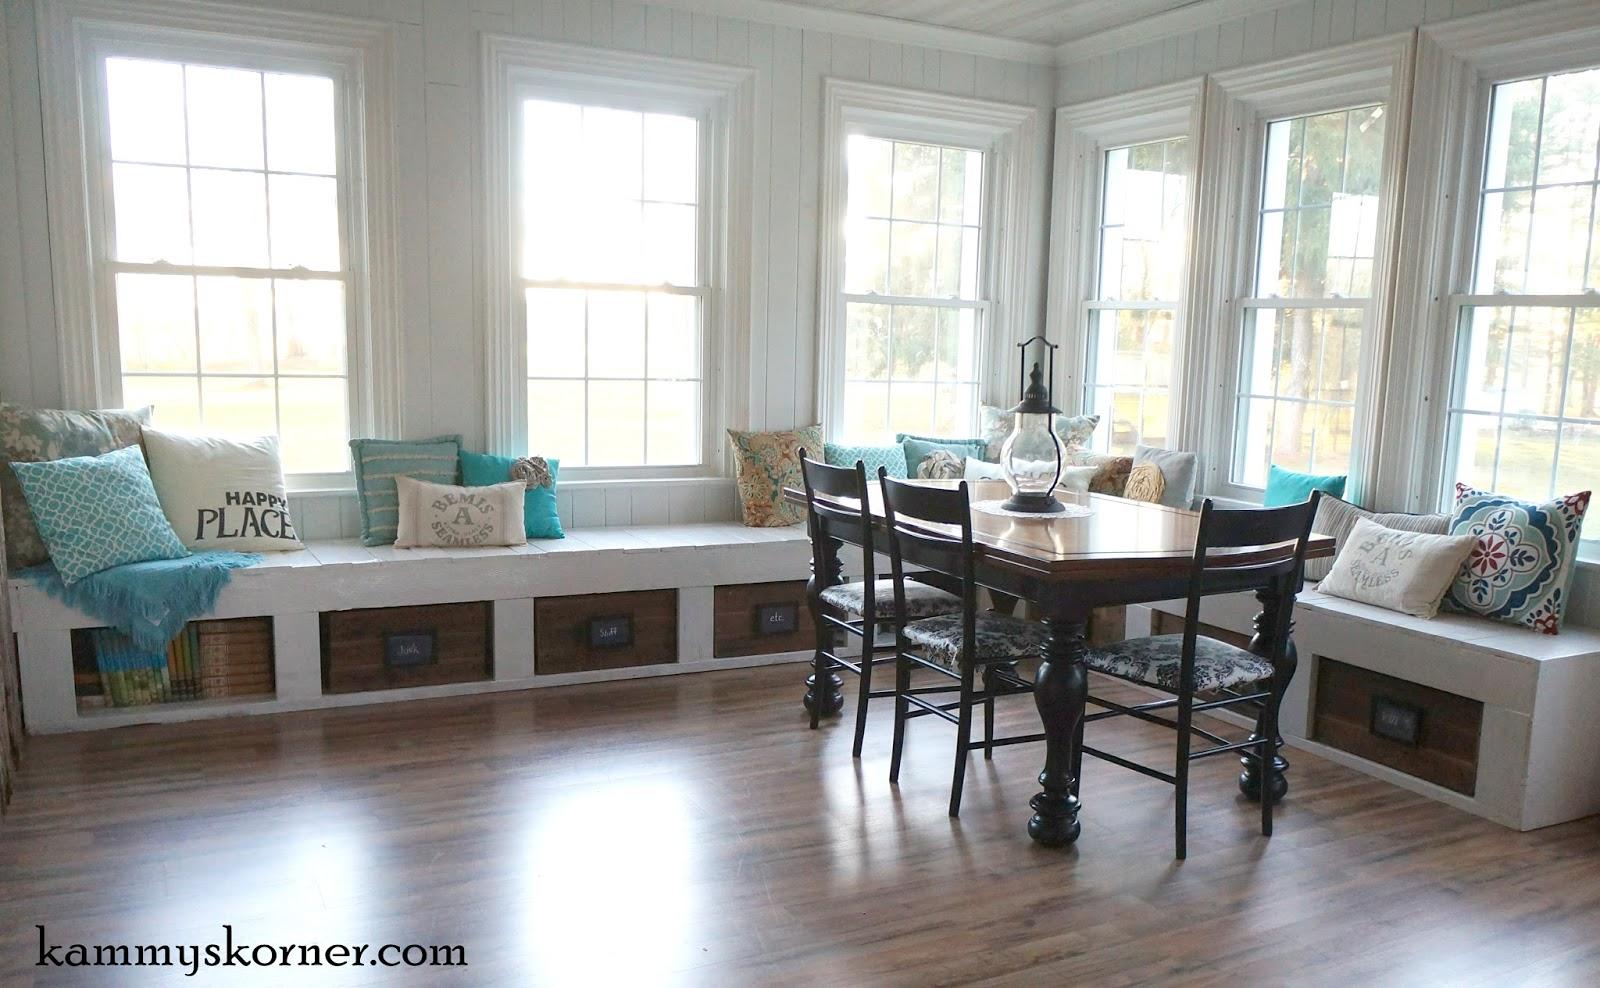 Windowseats kammy's korner: one of a kind window seats from a planked wood walkway